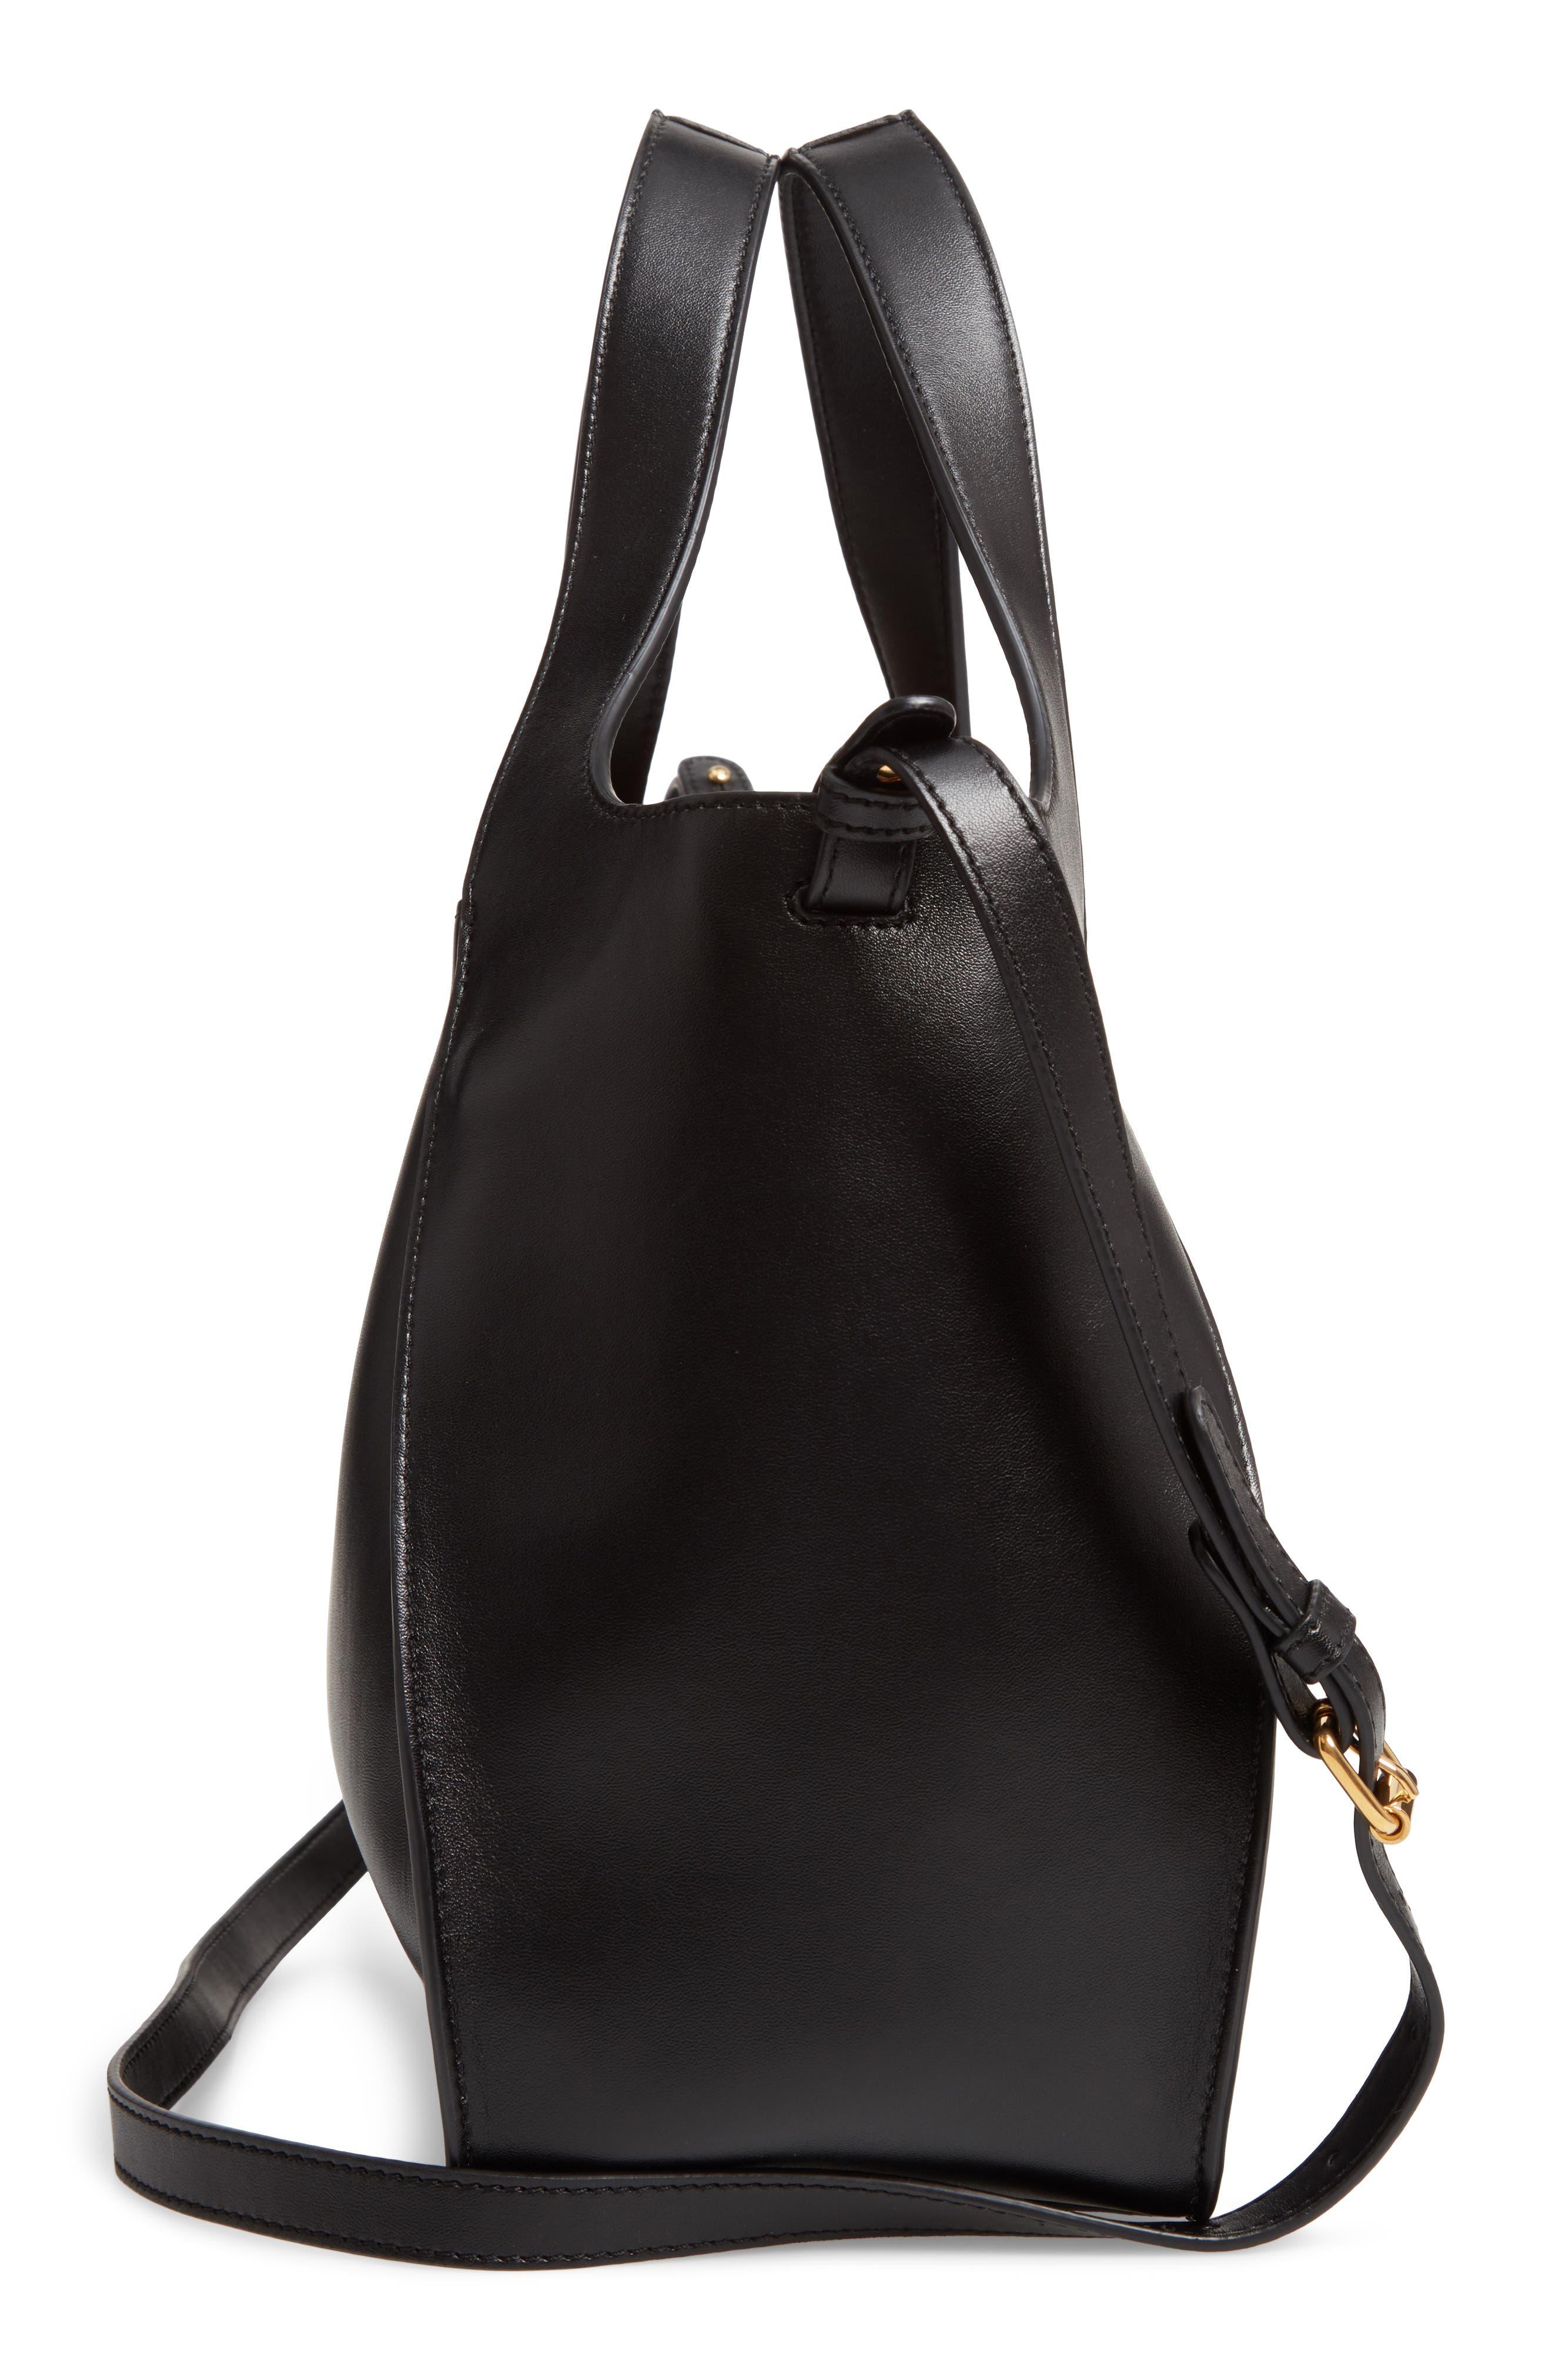 STELLA MCCARTNEY, Perforated Logo Faux Leather Satchel, Alternate thumbnail 5, color, BLACK